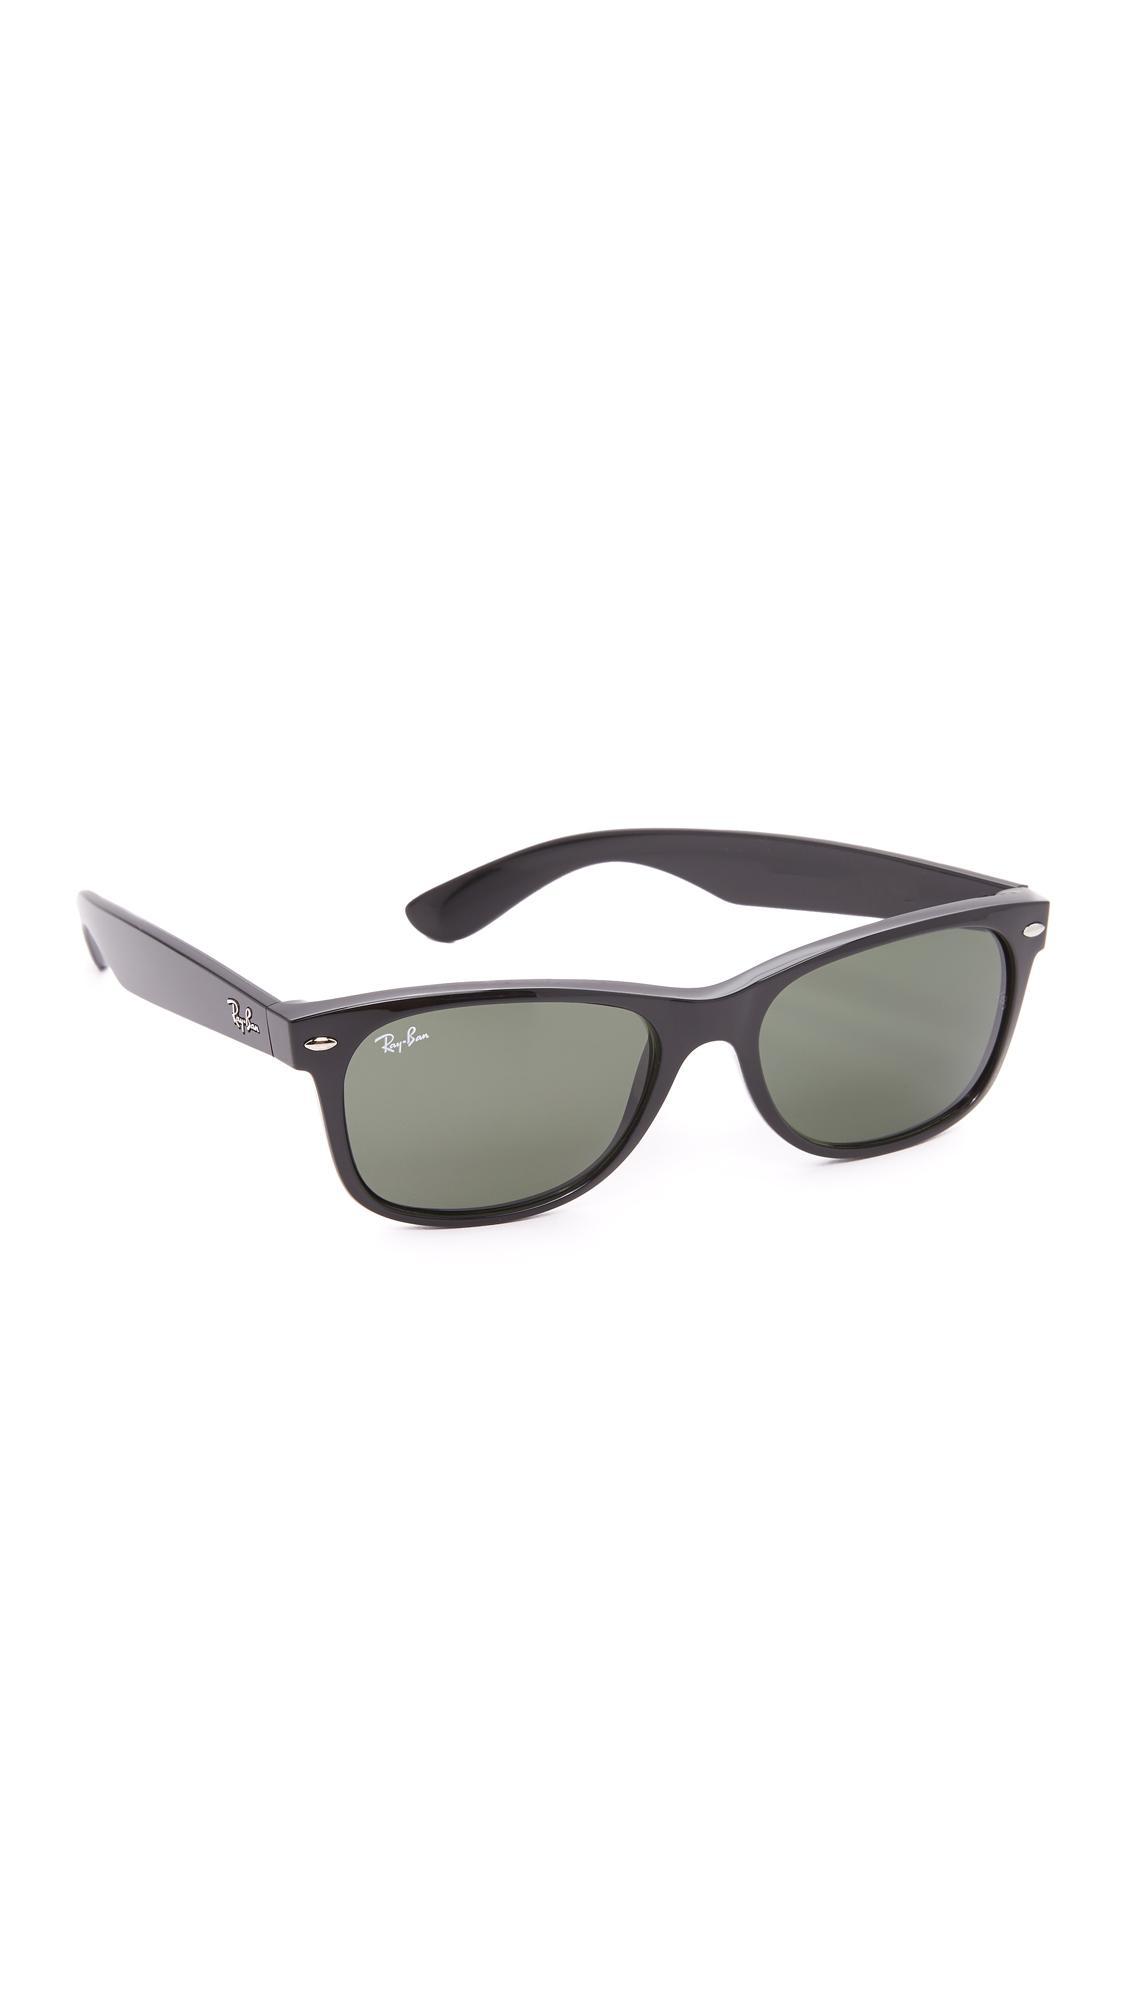 1f03f0ea786 Zoo York Plastic Aviator Sunglasses « One More Soul